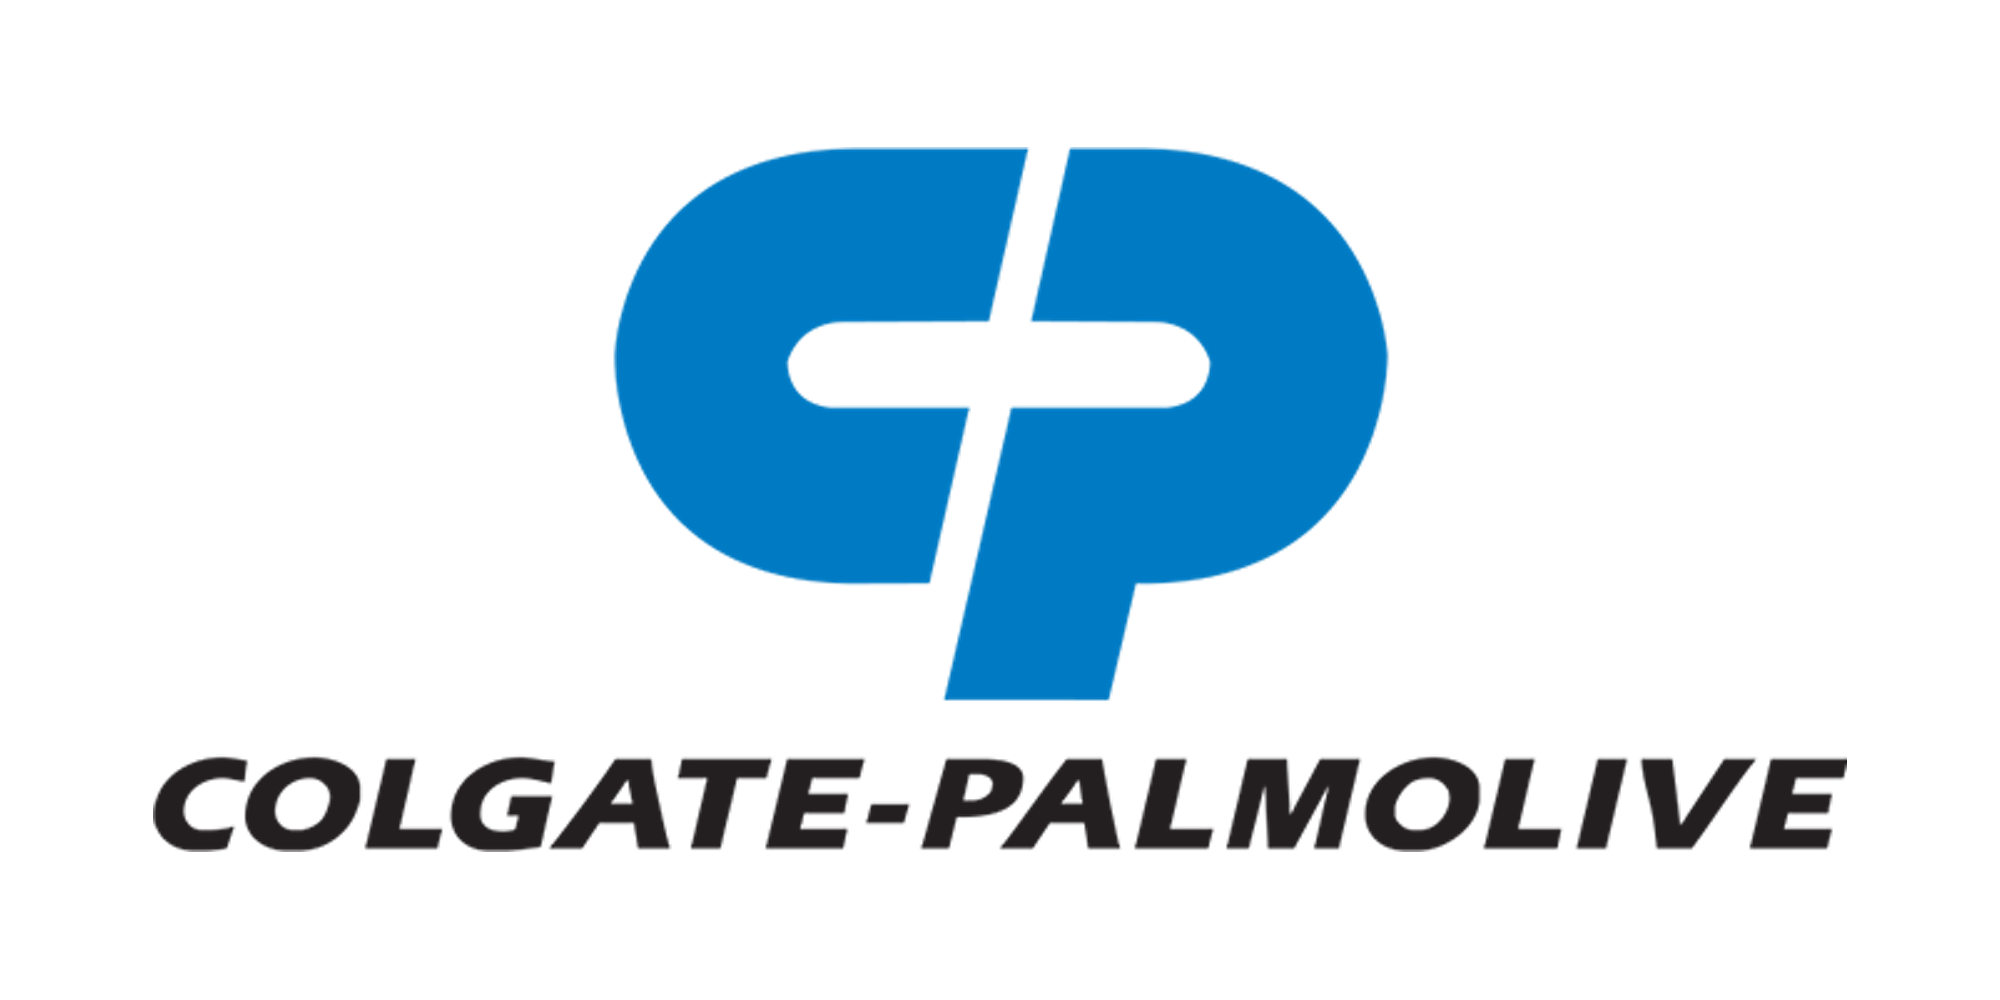 logo - colgate palmolive